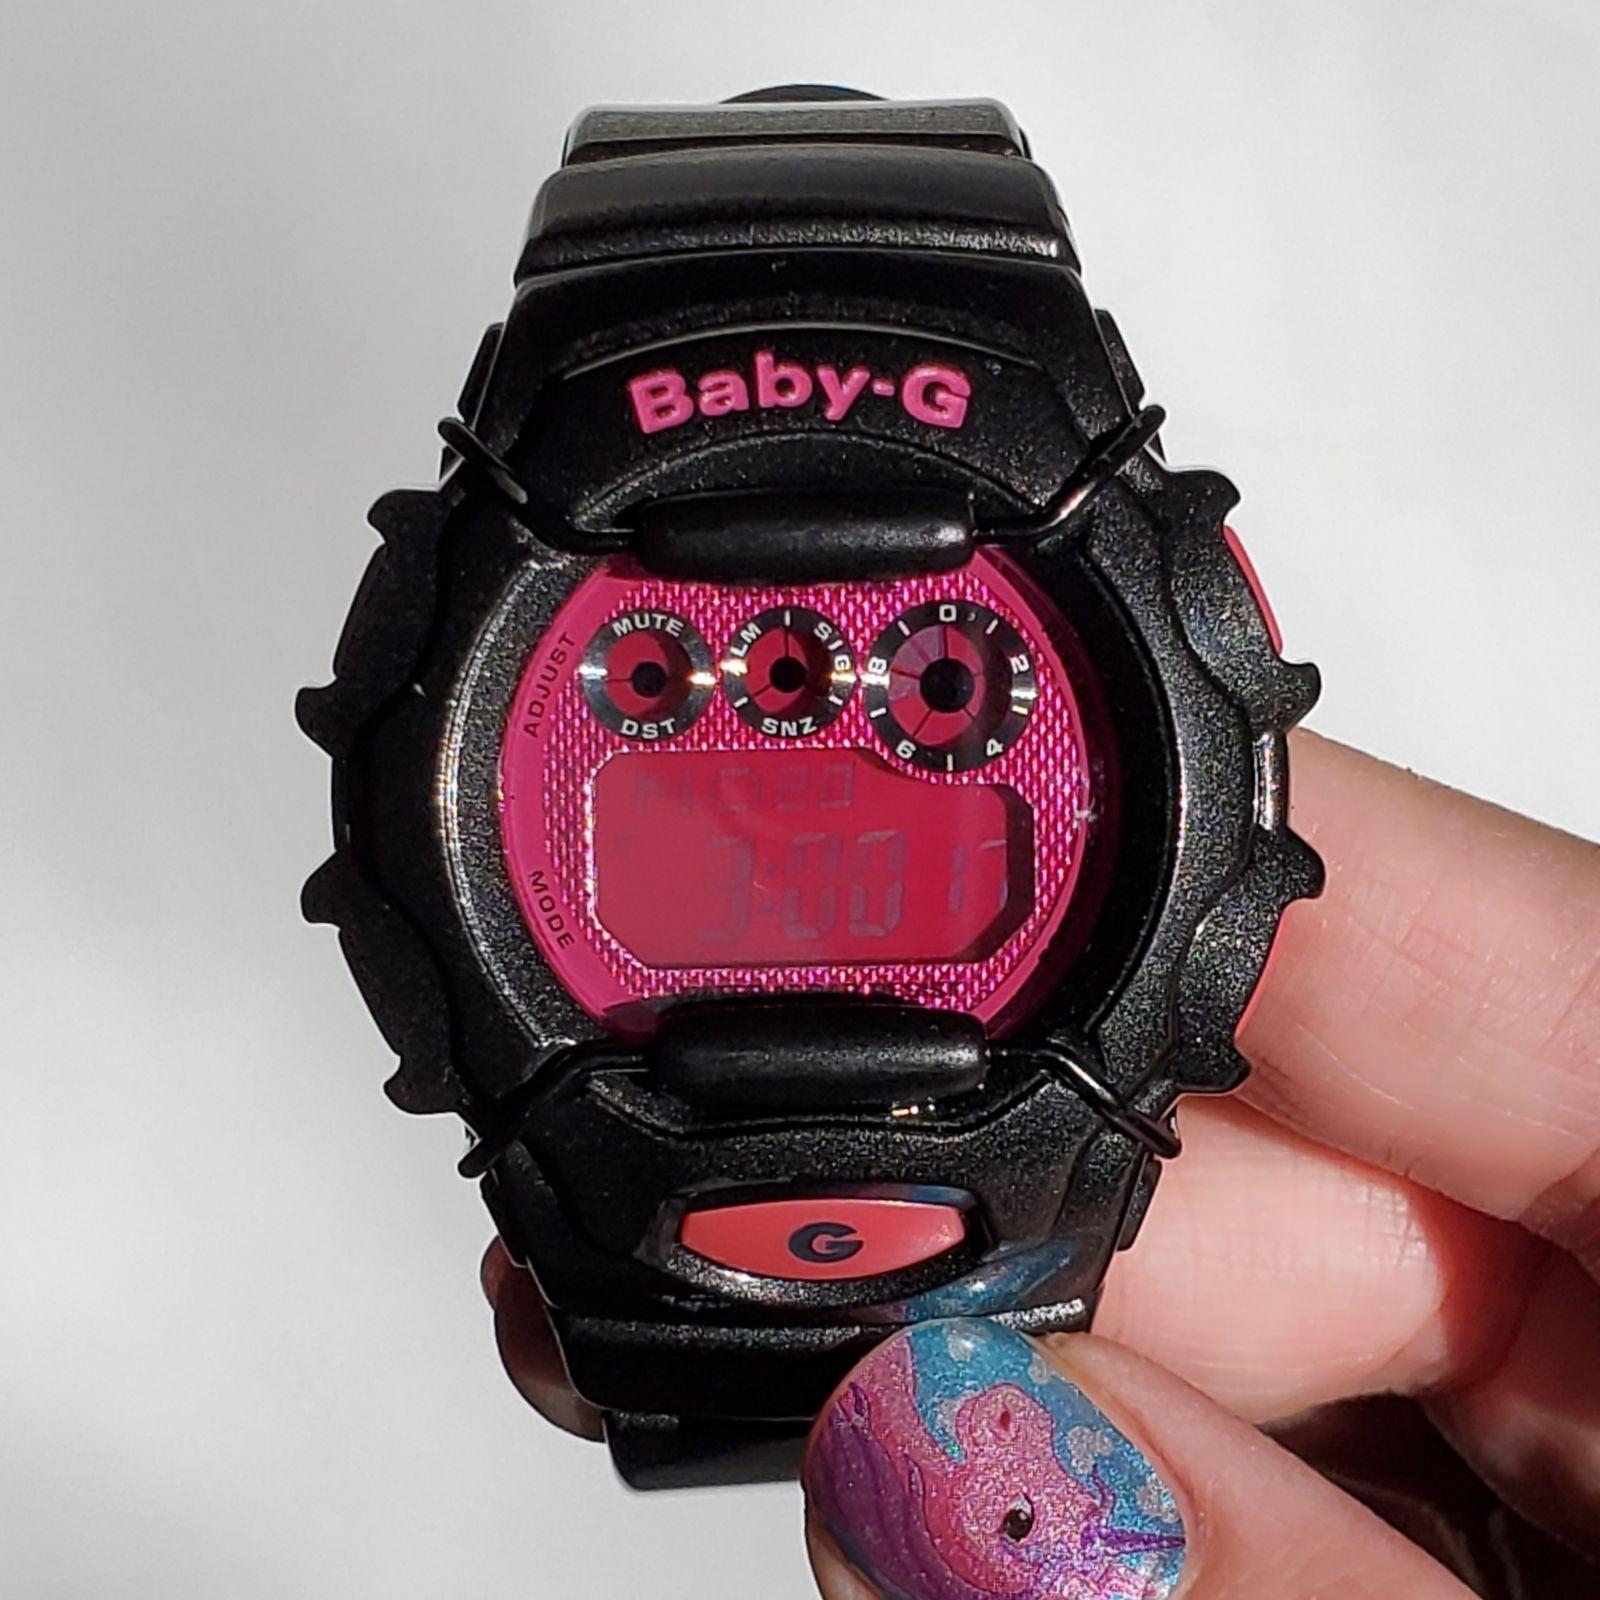 Casio Baby-G Watch BG1006SA-1 Black Pink